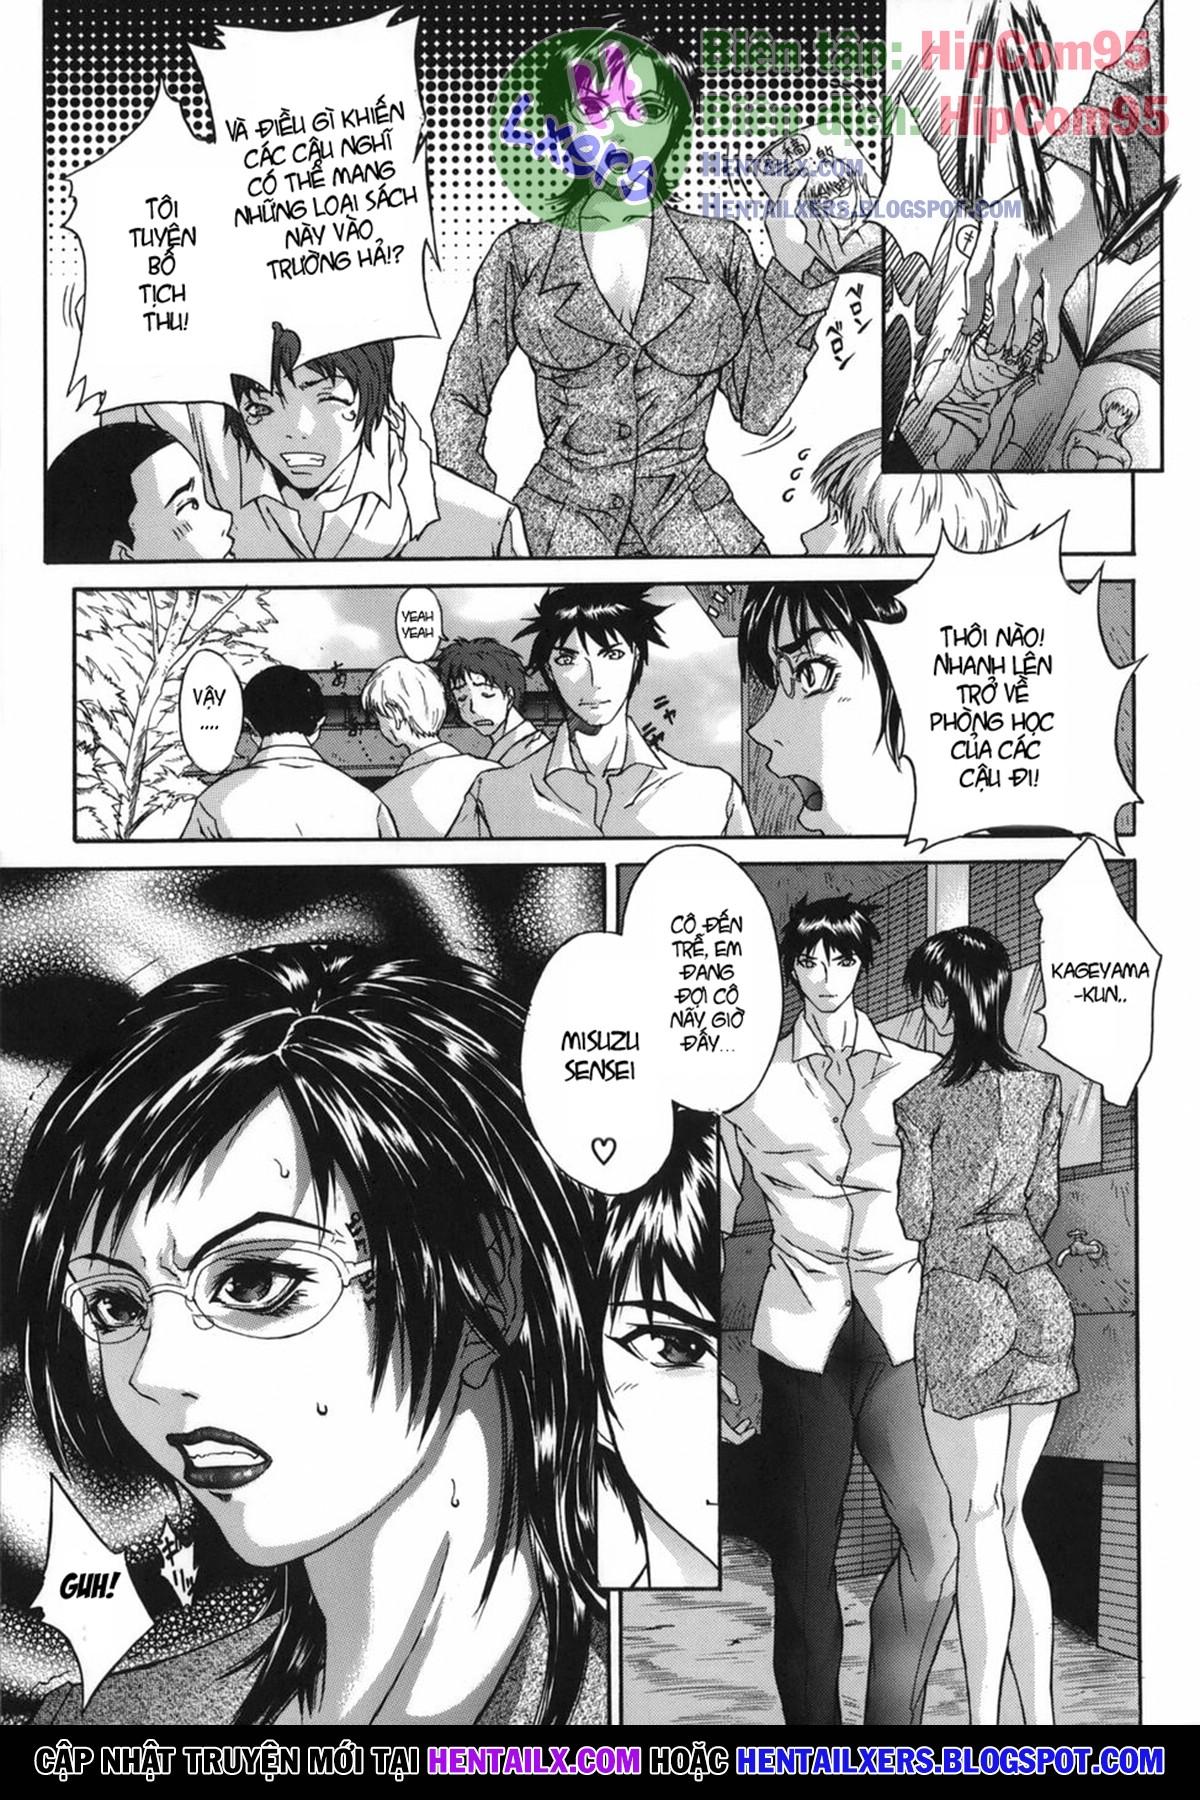 Hình ảnh 009_boinzuma_009 in Boinzuma - Motherlike Obscene Wife